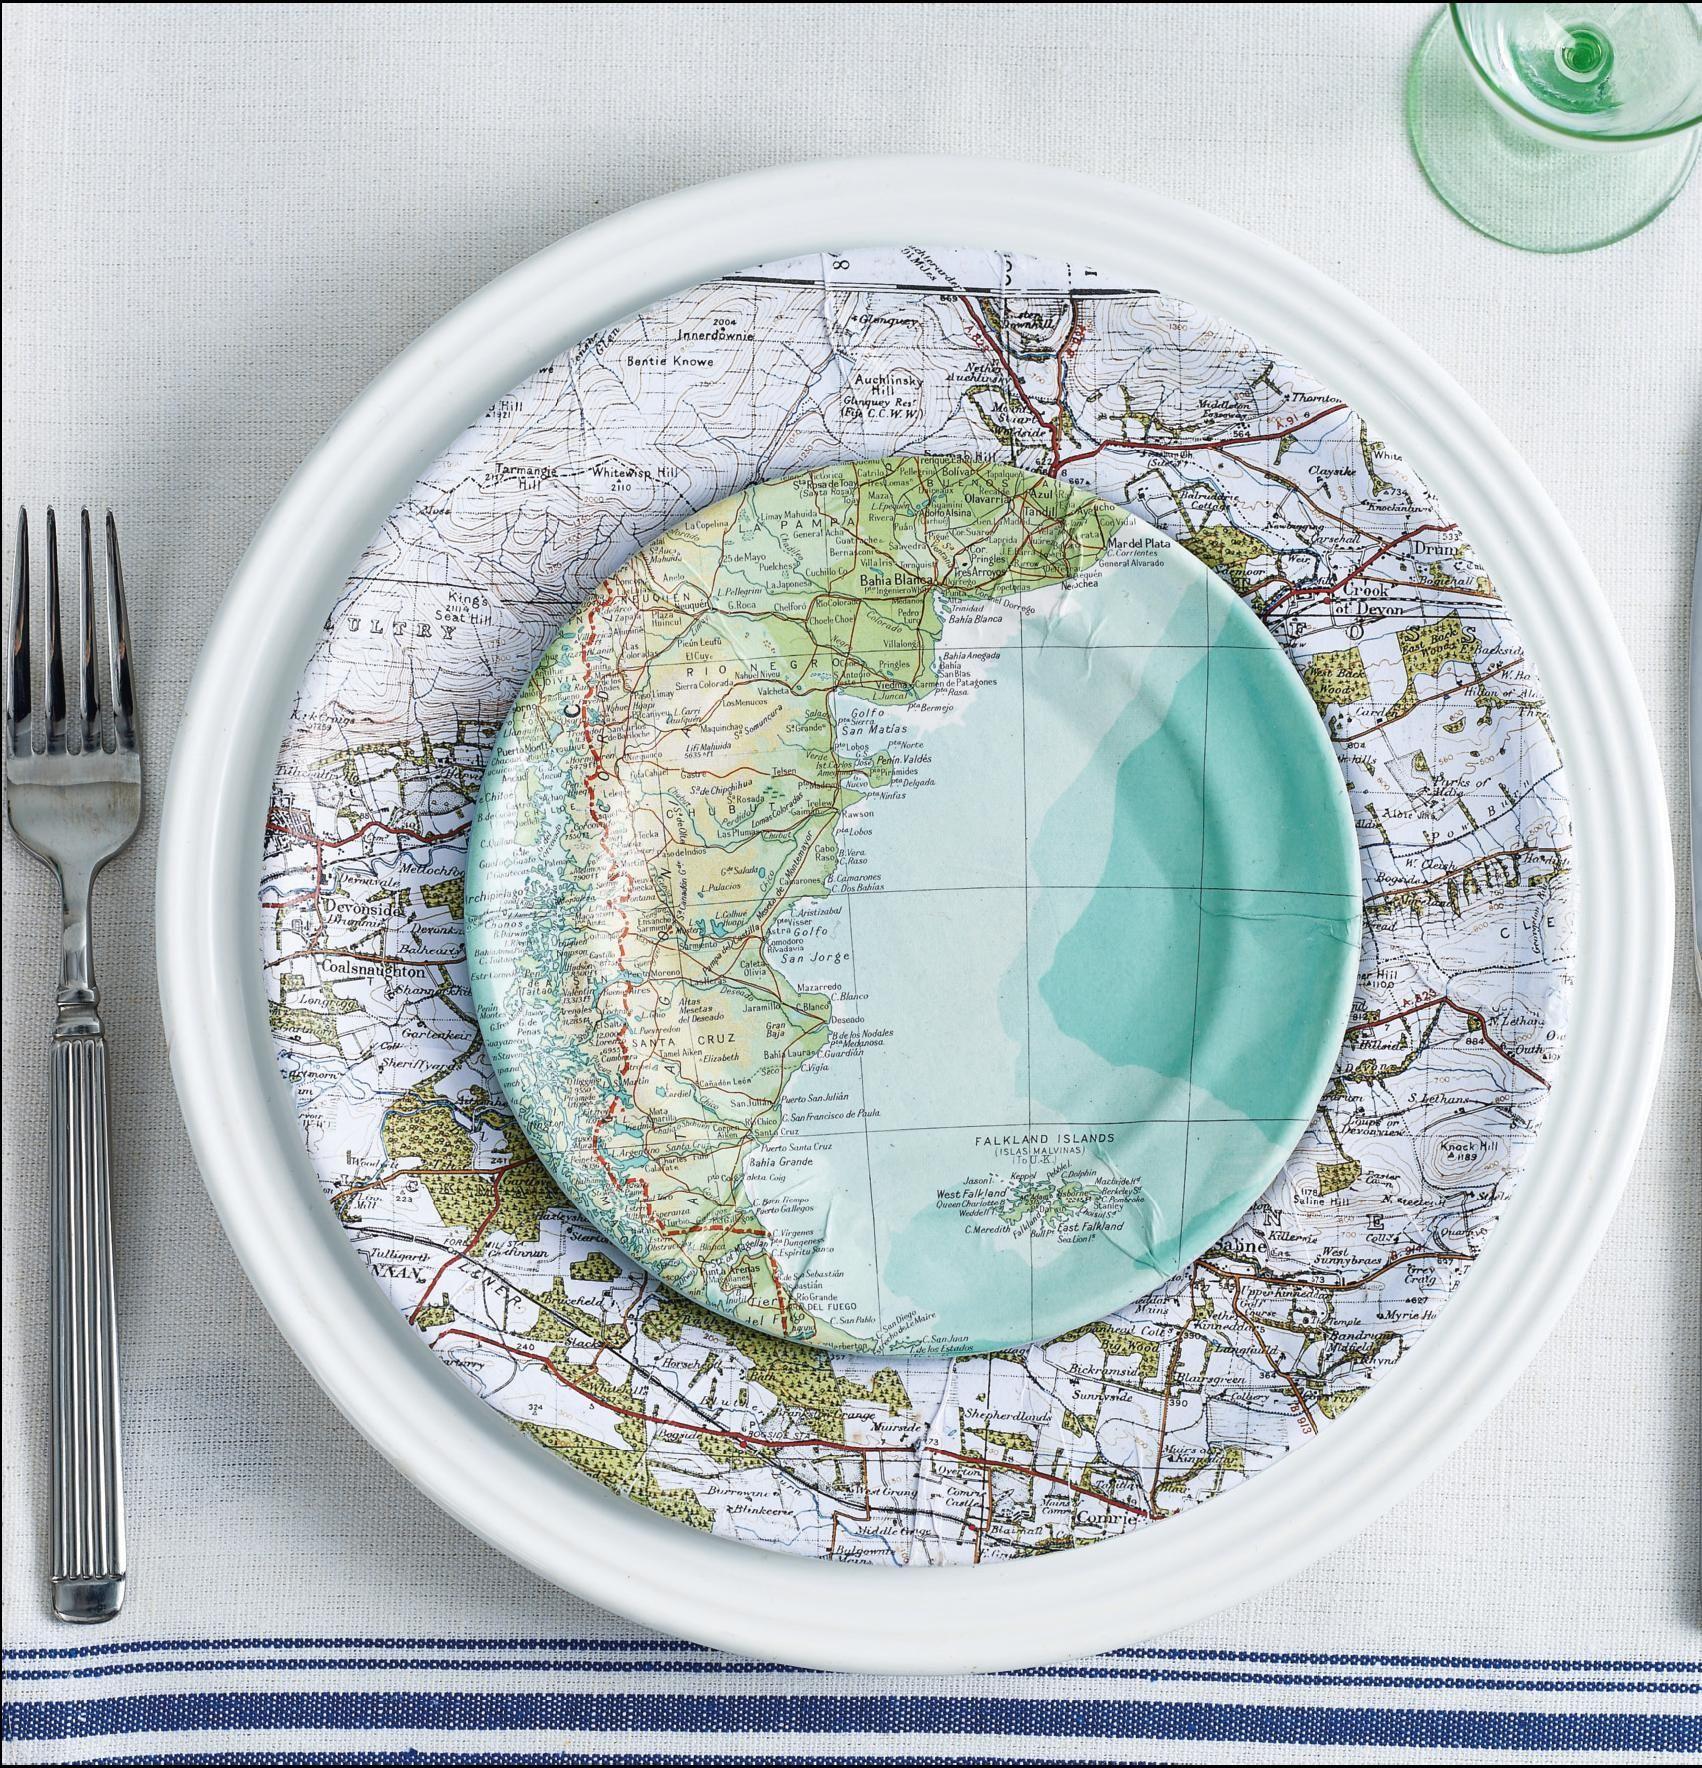 #map #plates #wordlmap #mapamundi